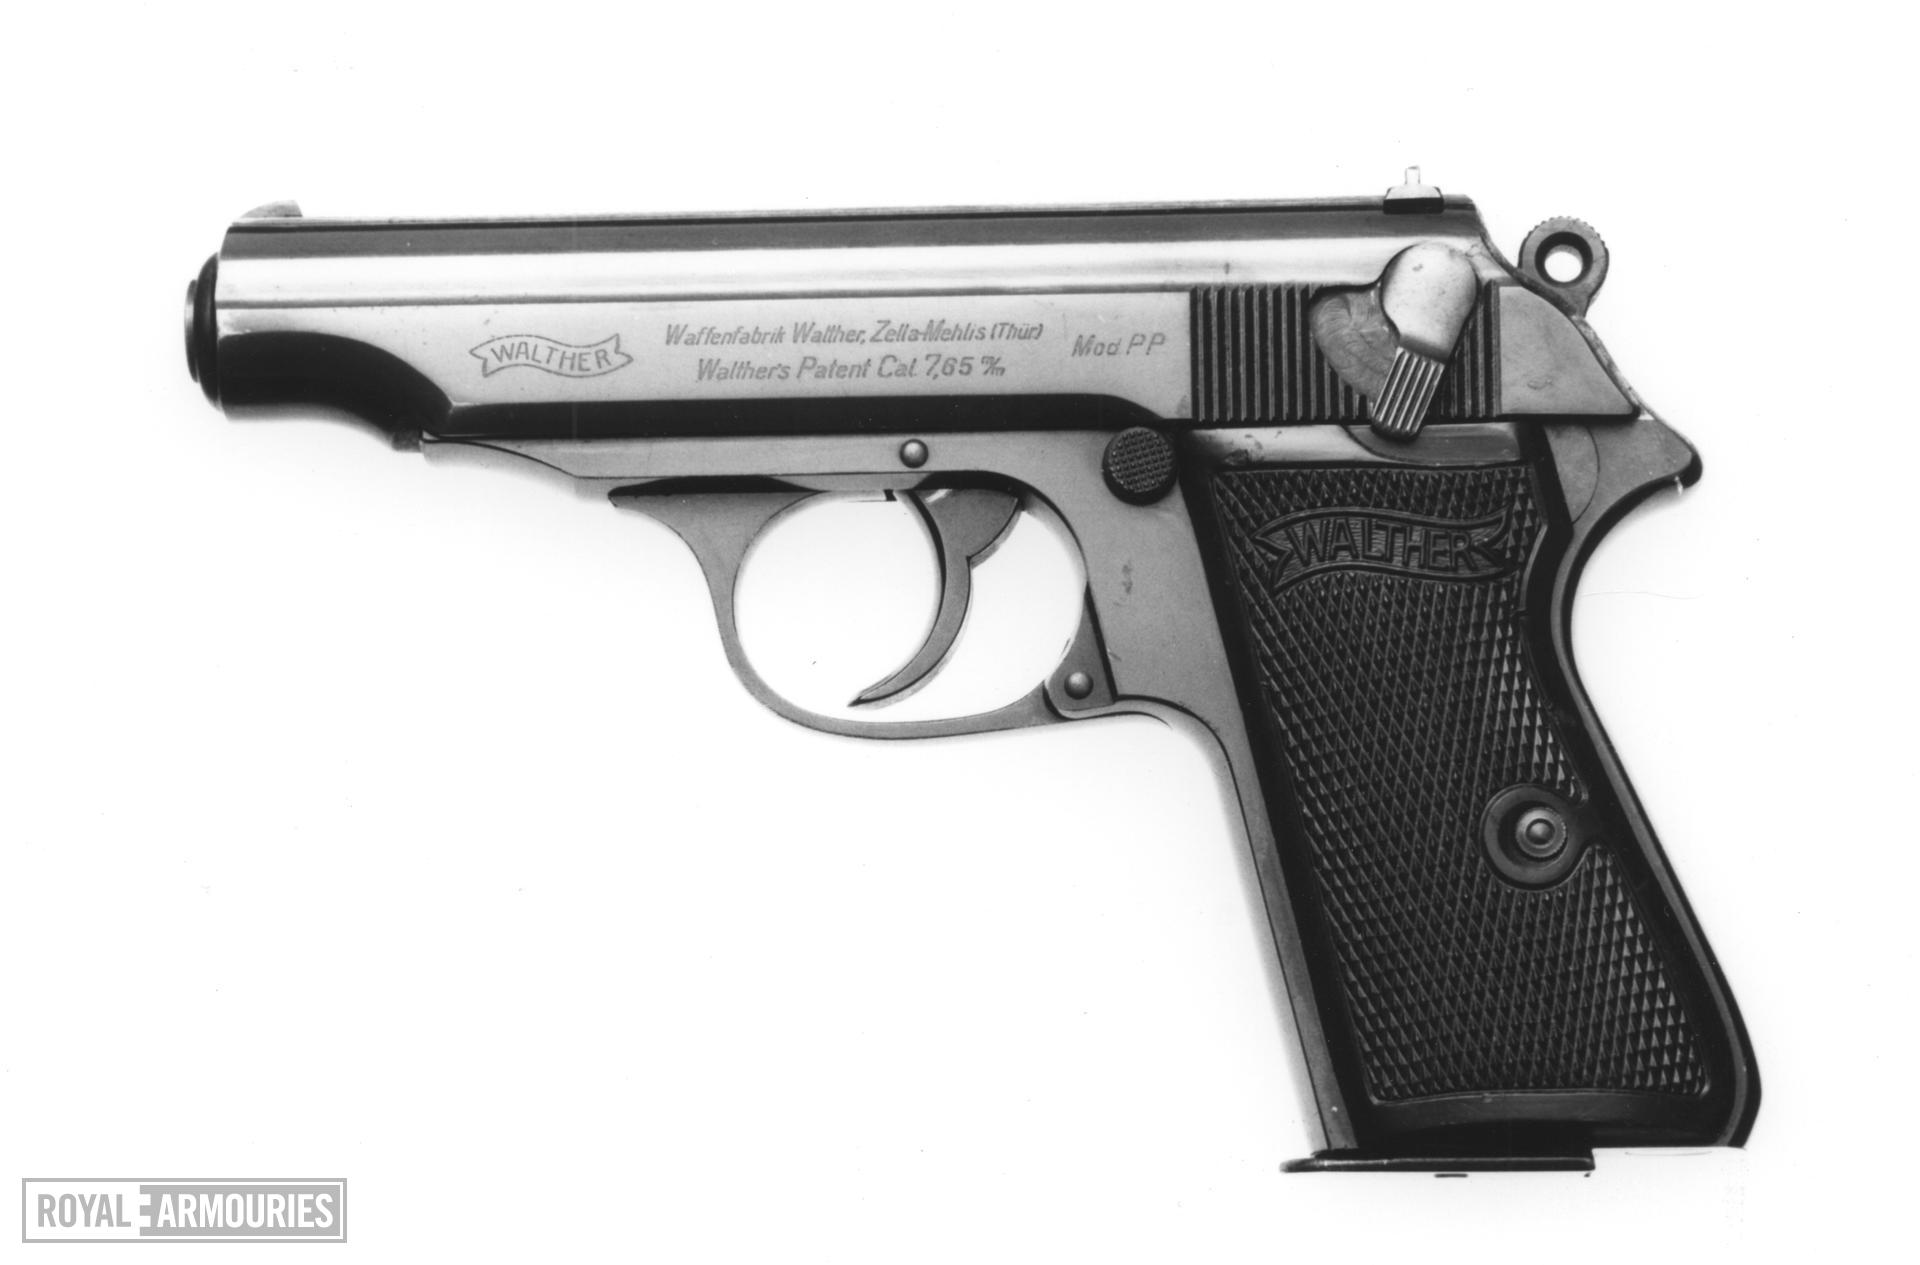 Centrefire self-loading pistol - Walther Model PP